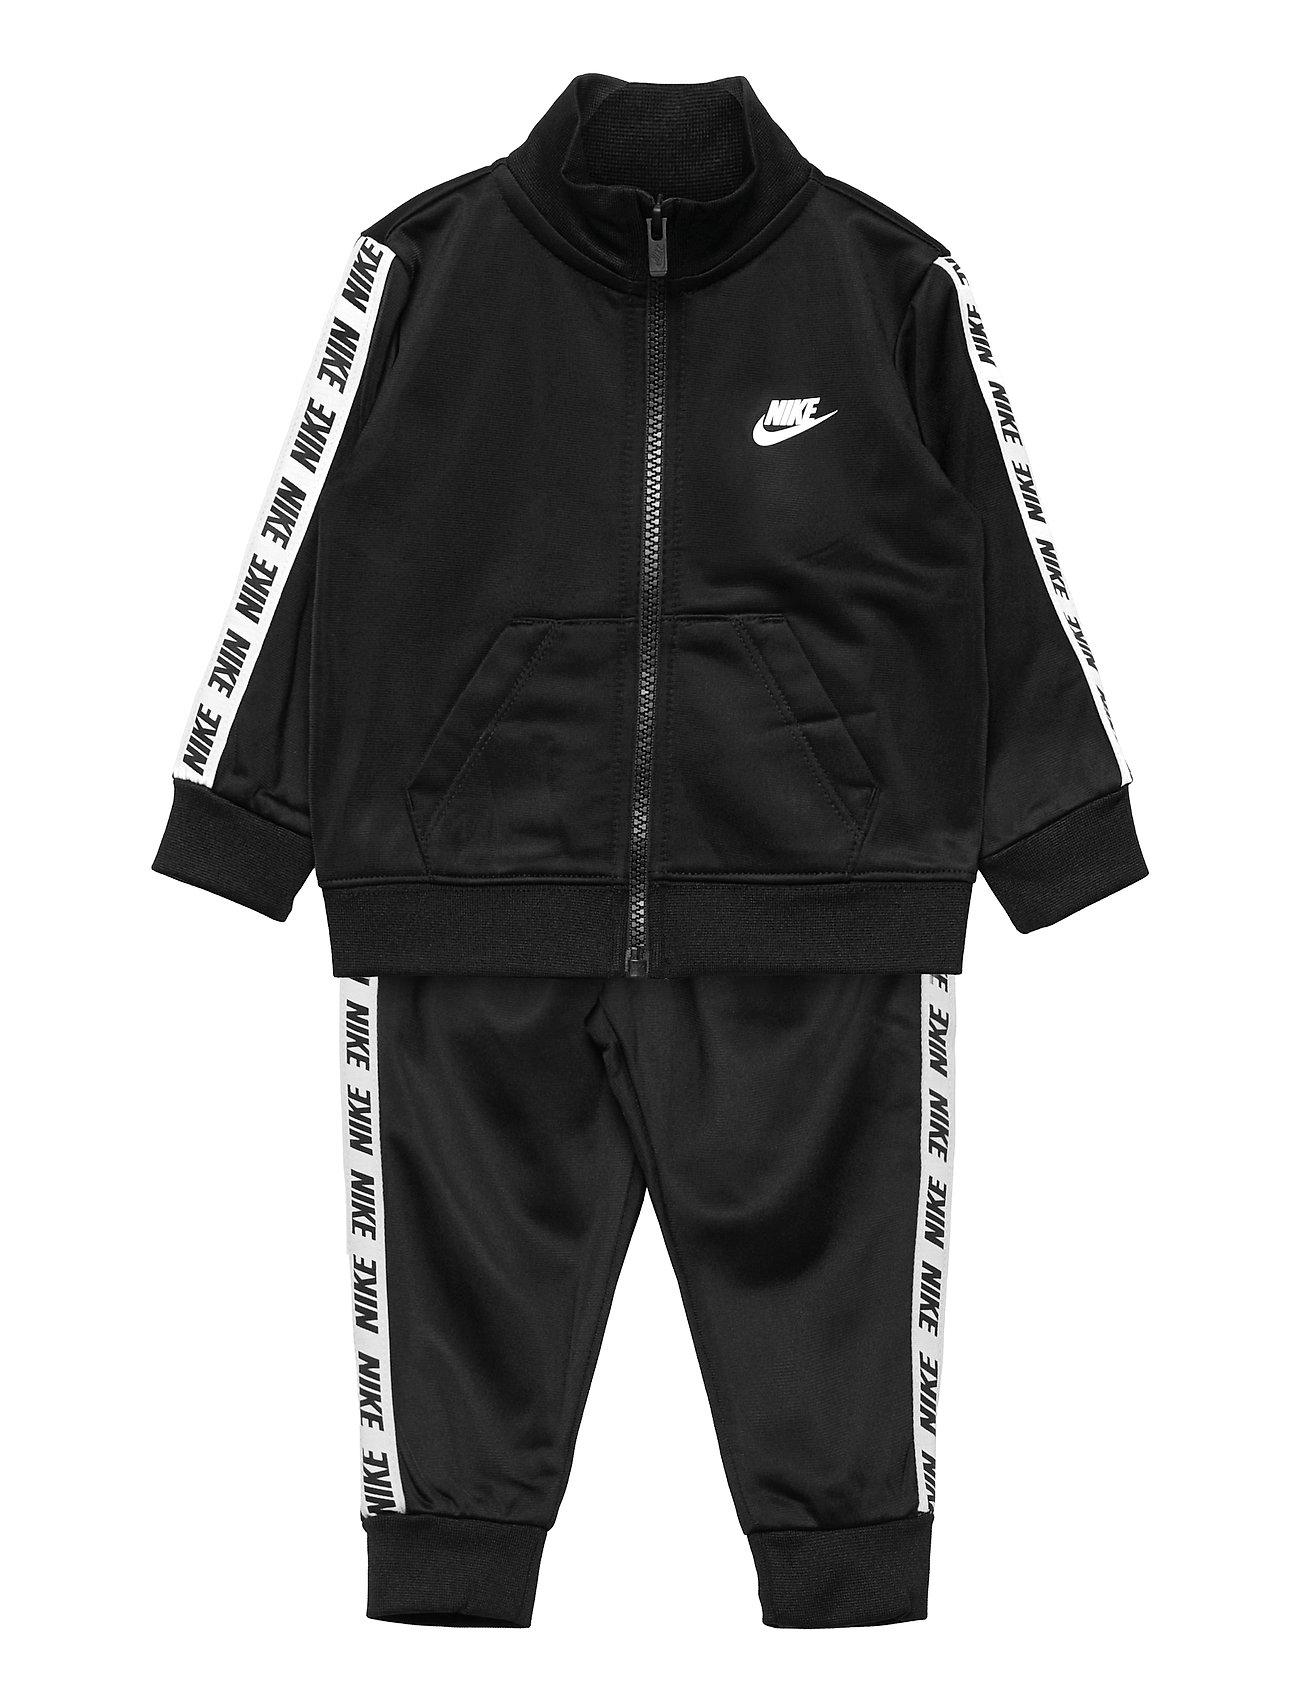 Nkb Nike Blk Taping Tricot Set Tracksuit Sort Nike